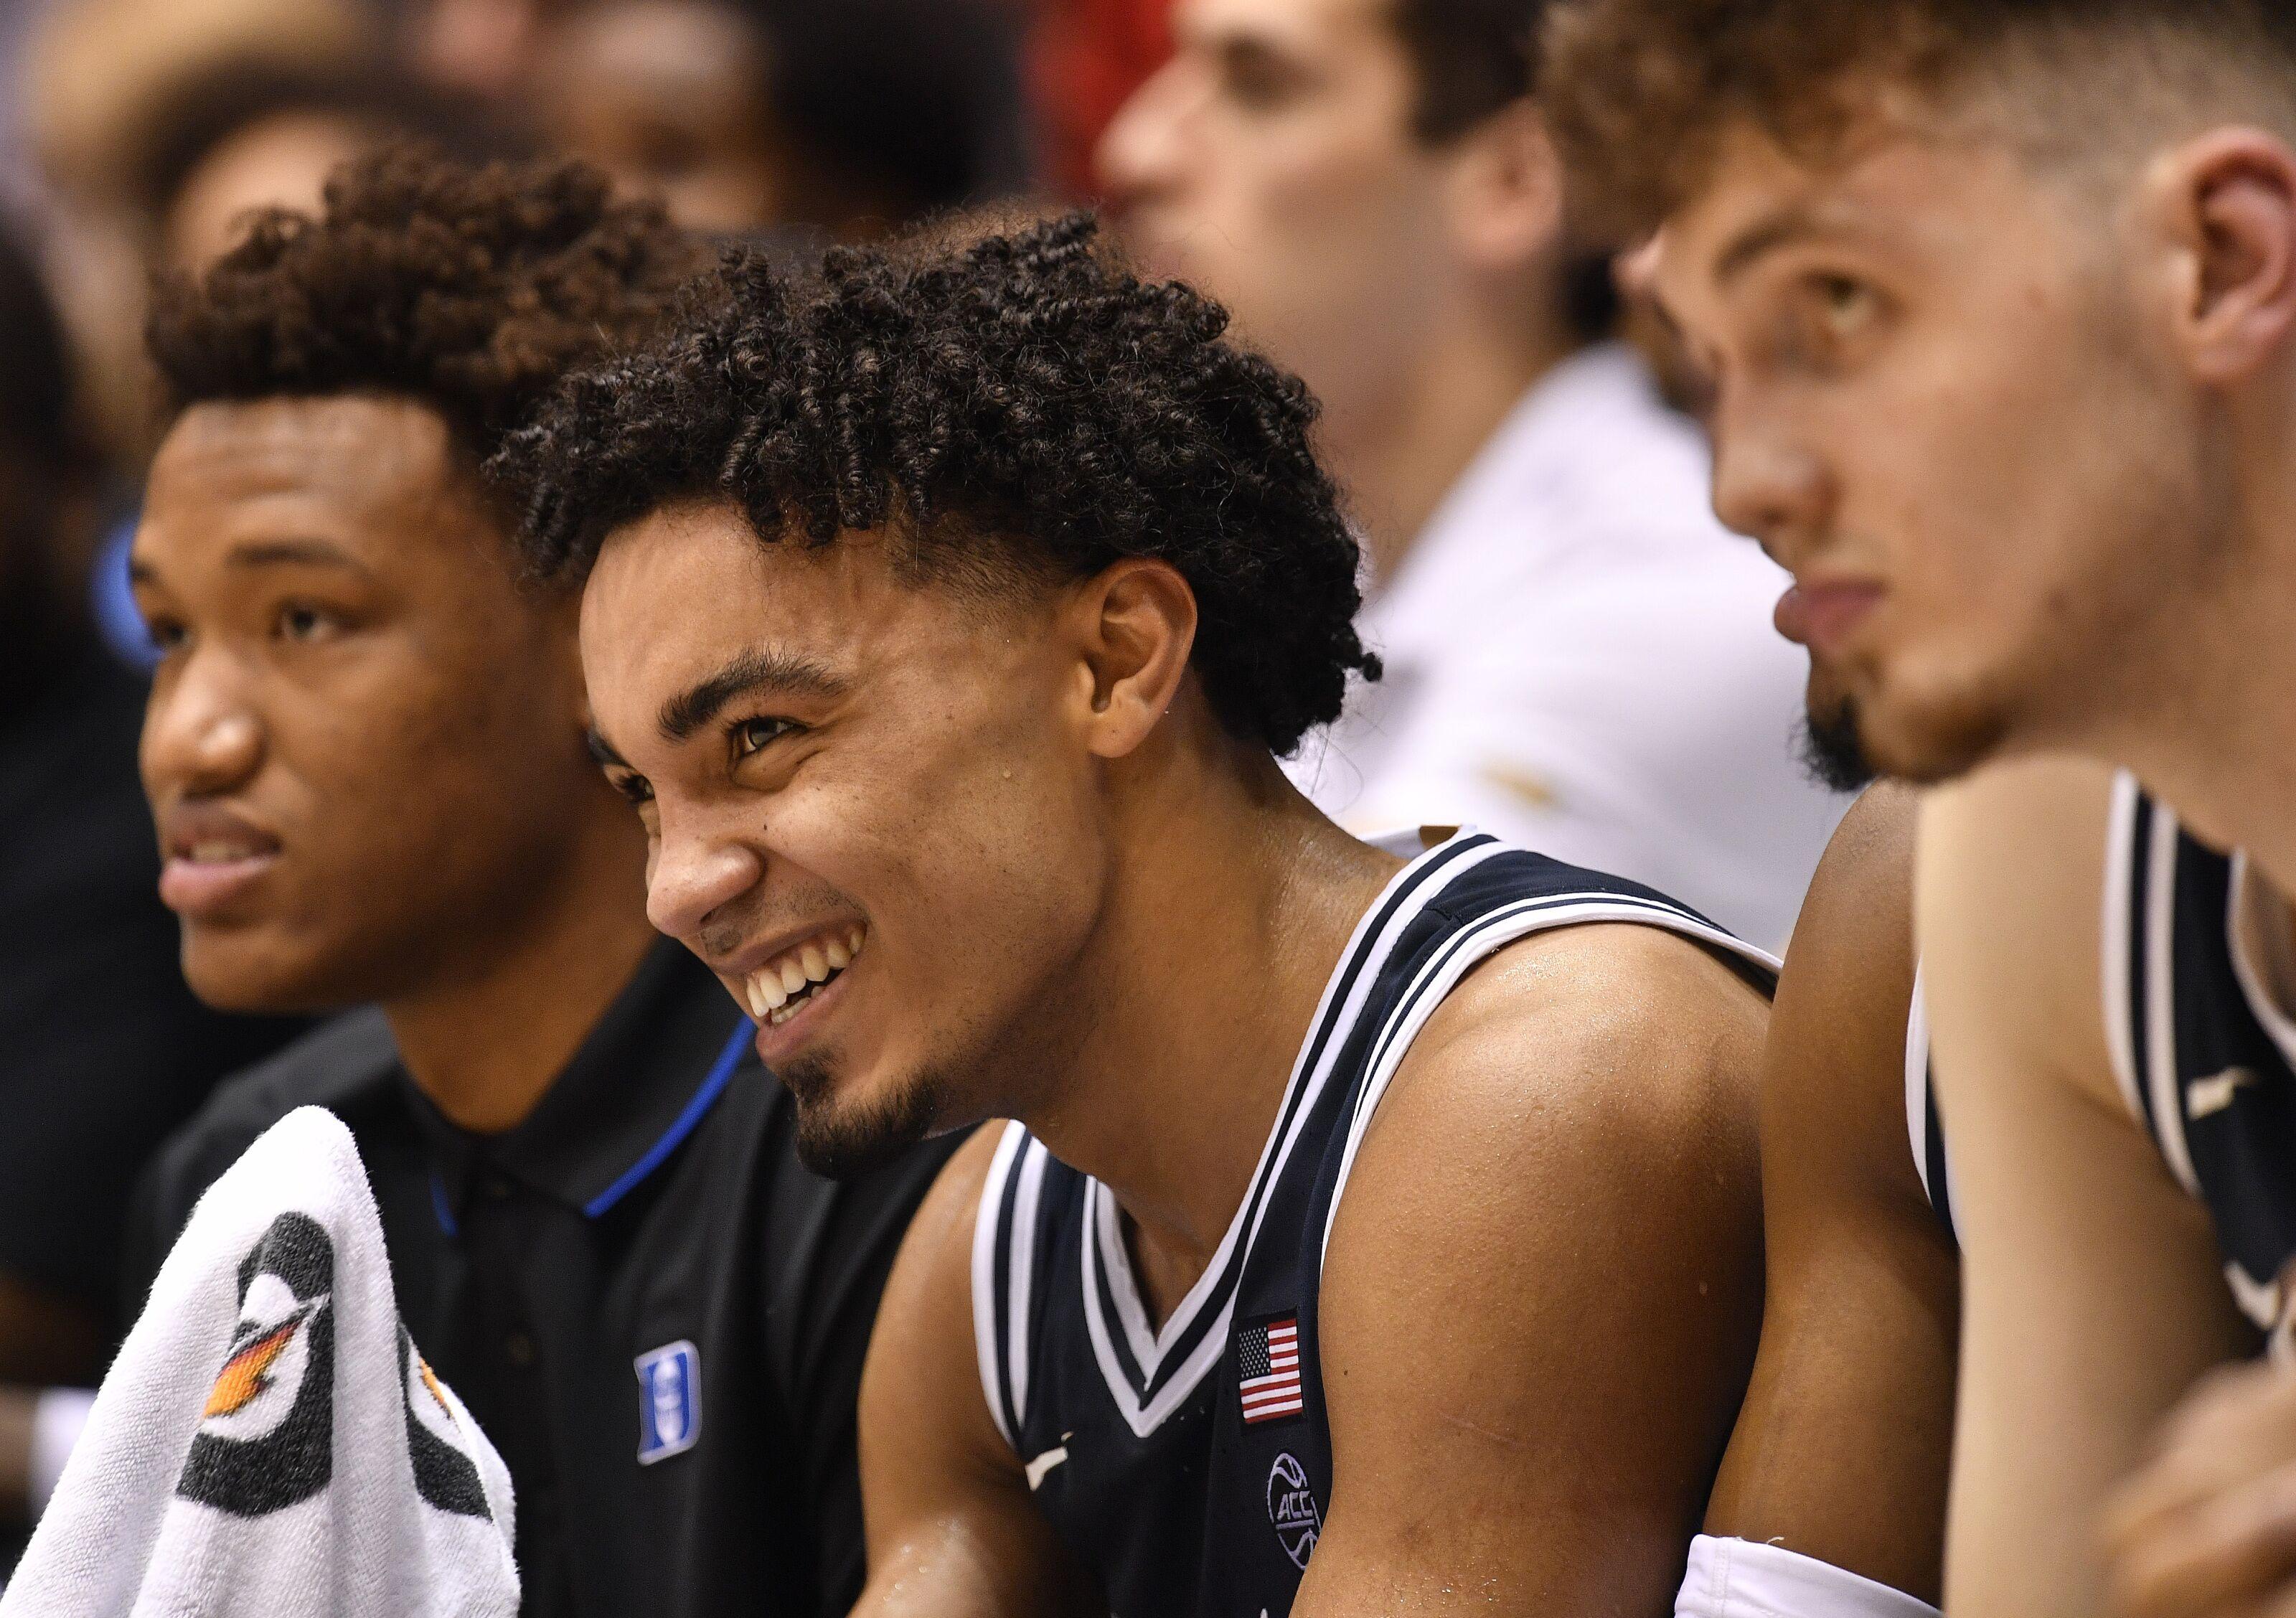 Louisville vs. Duke: 2019-20 college basketball game preview, TV schedule